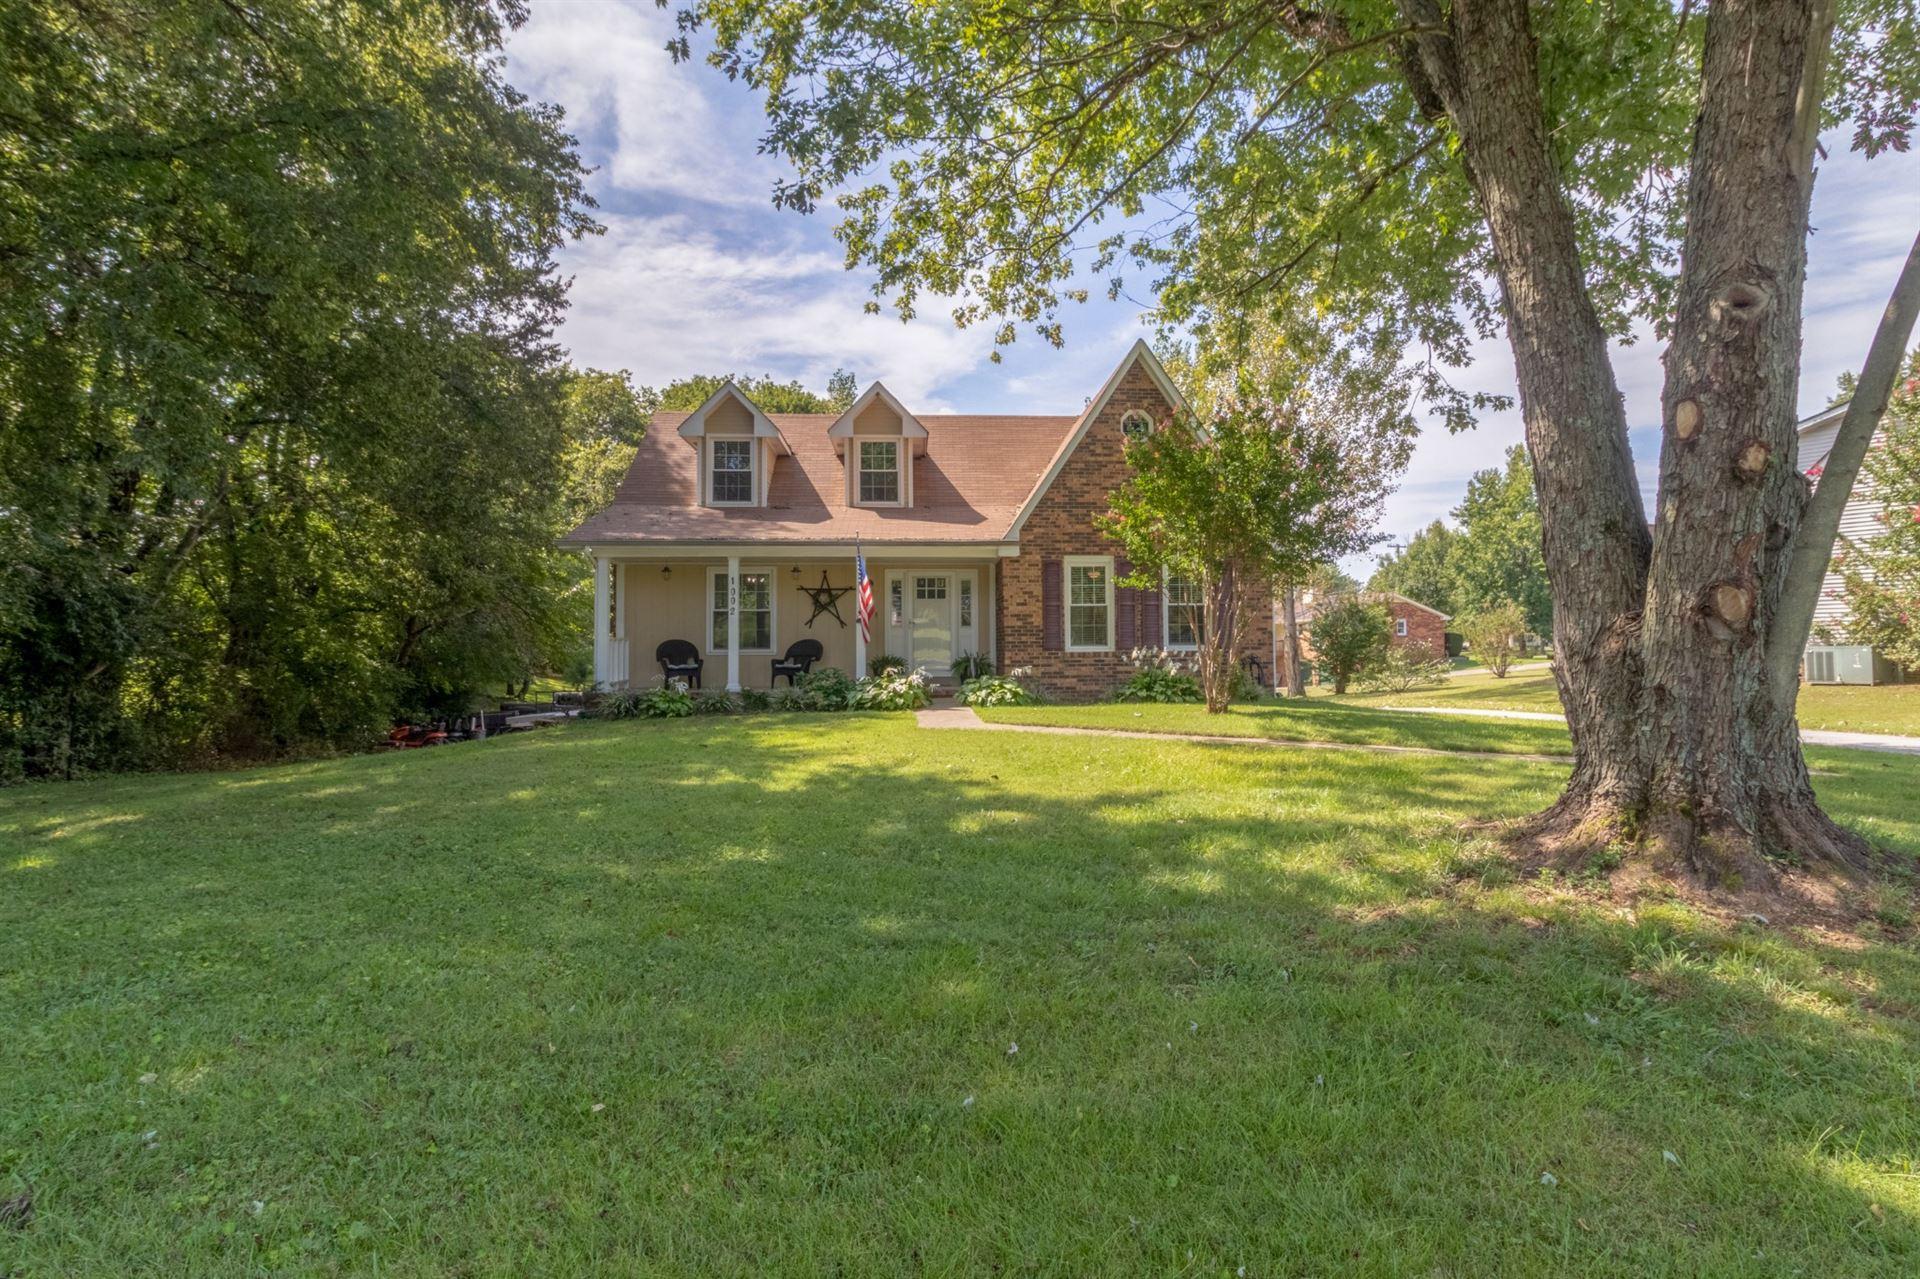 1002 Rossview Rd, Clarksville, TN 37043 - MLS#: 2288445